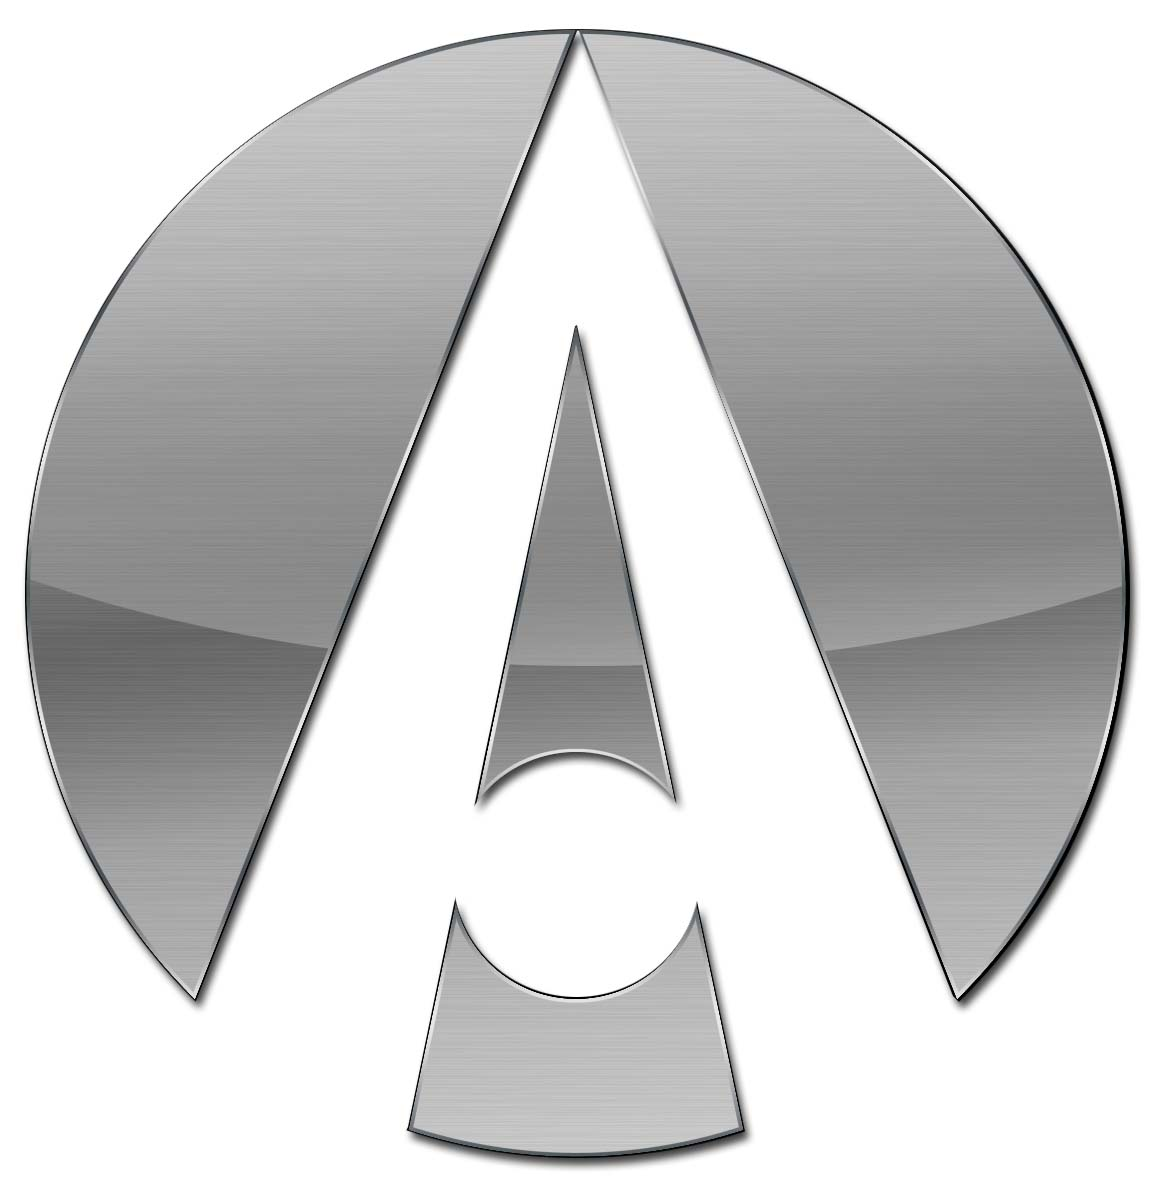 Ariel Motor Company Ltd (Crewkerne, Somerset)(2006)